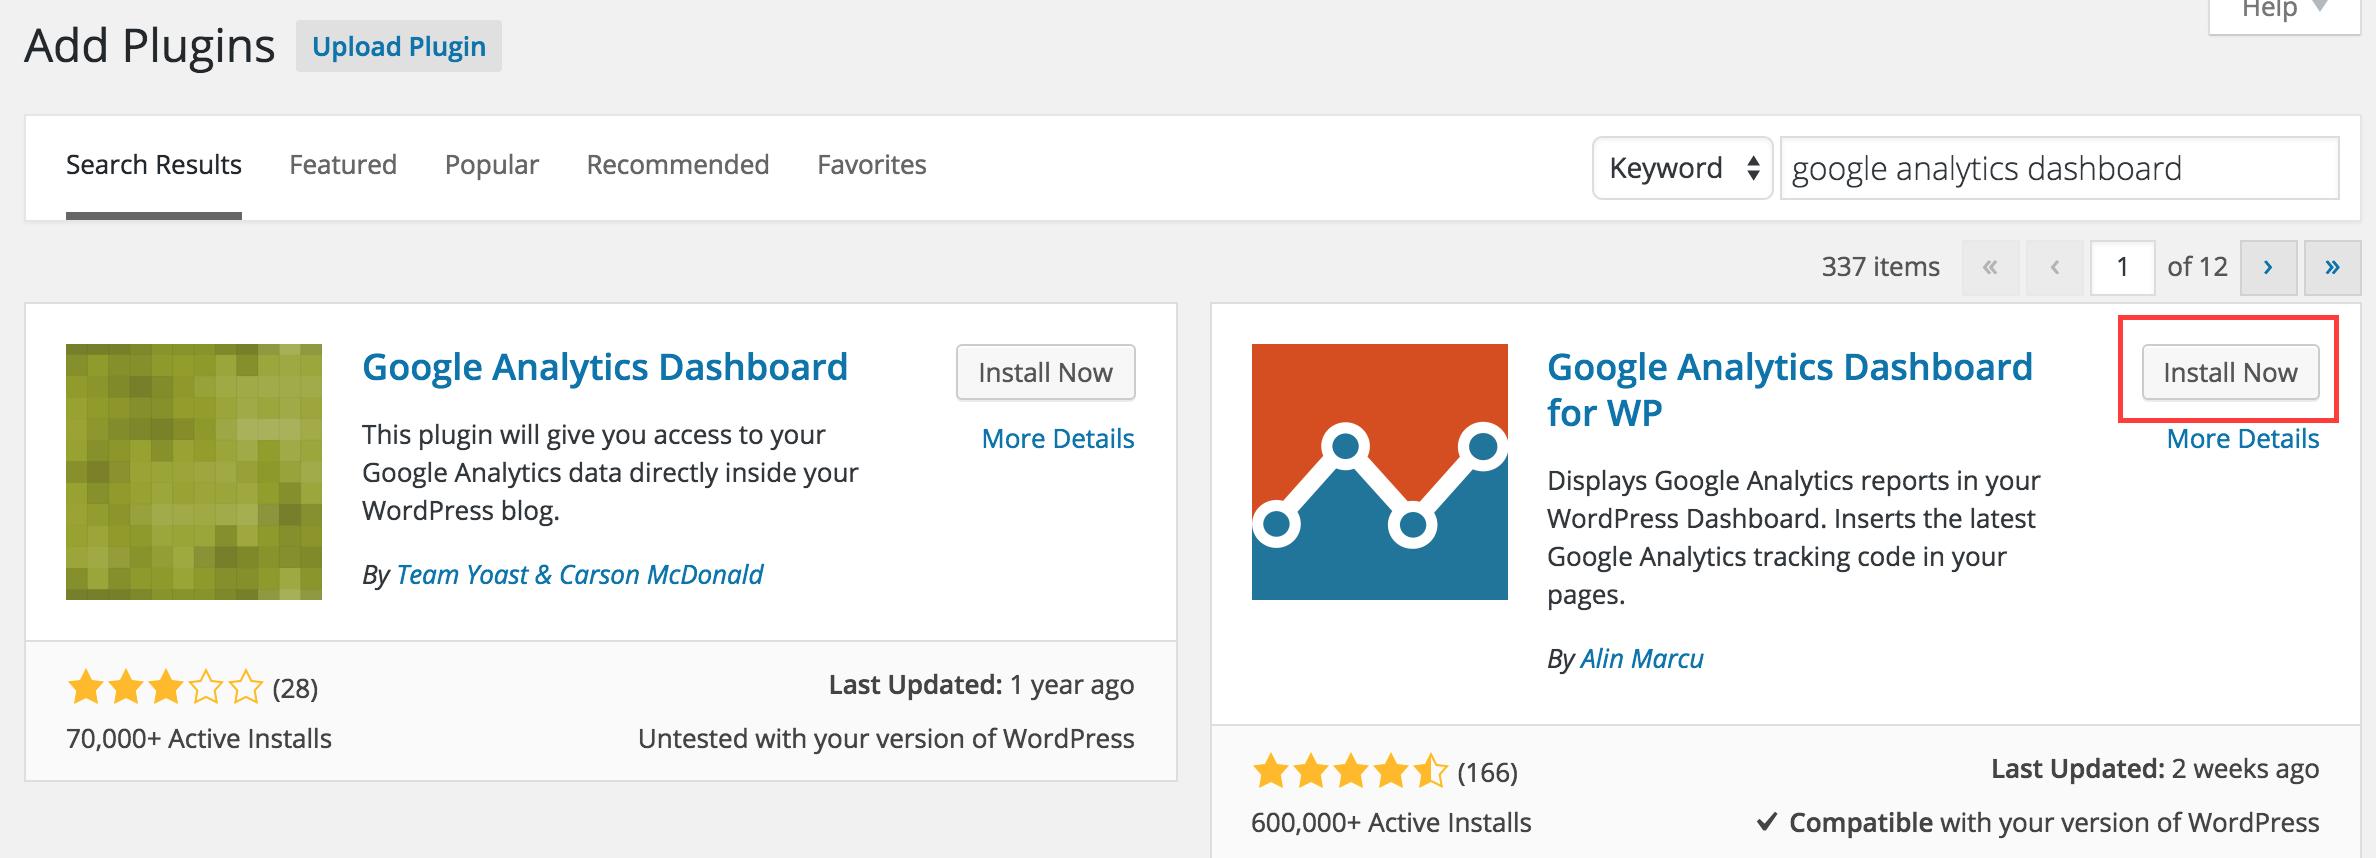 how to add new url in google analytics